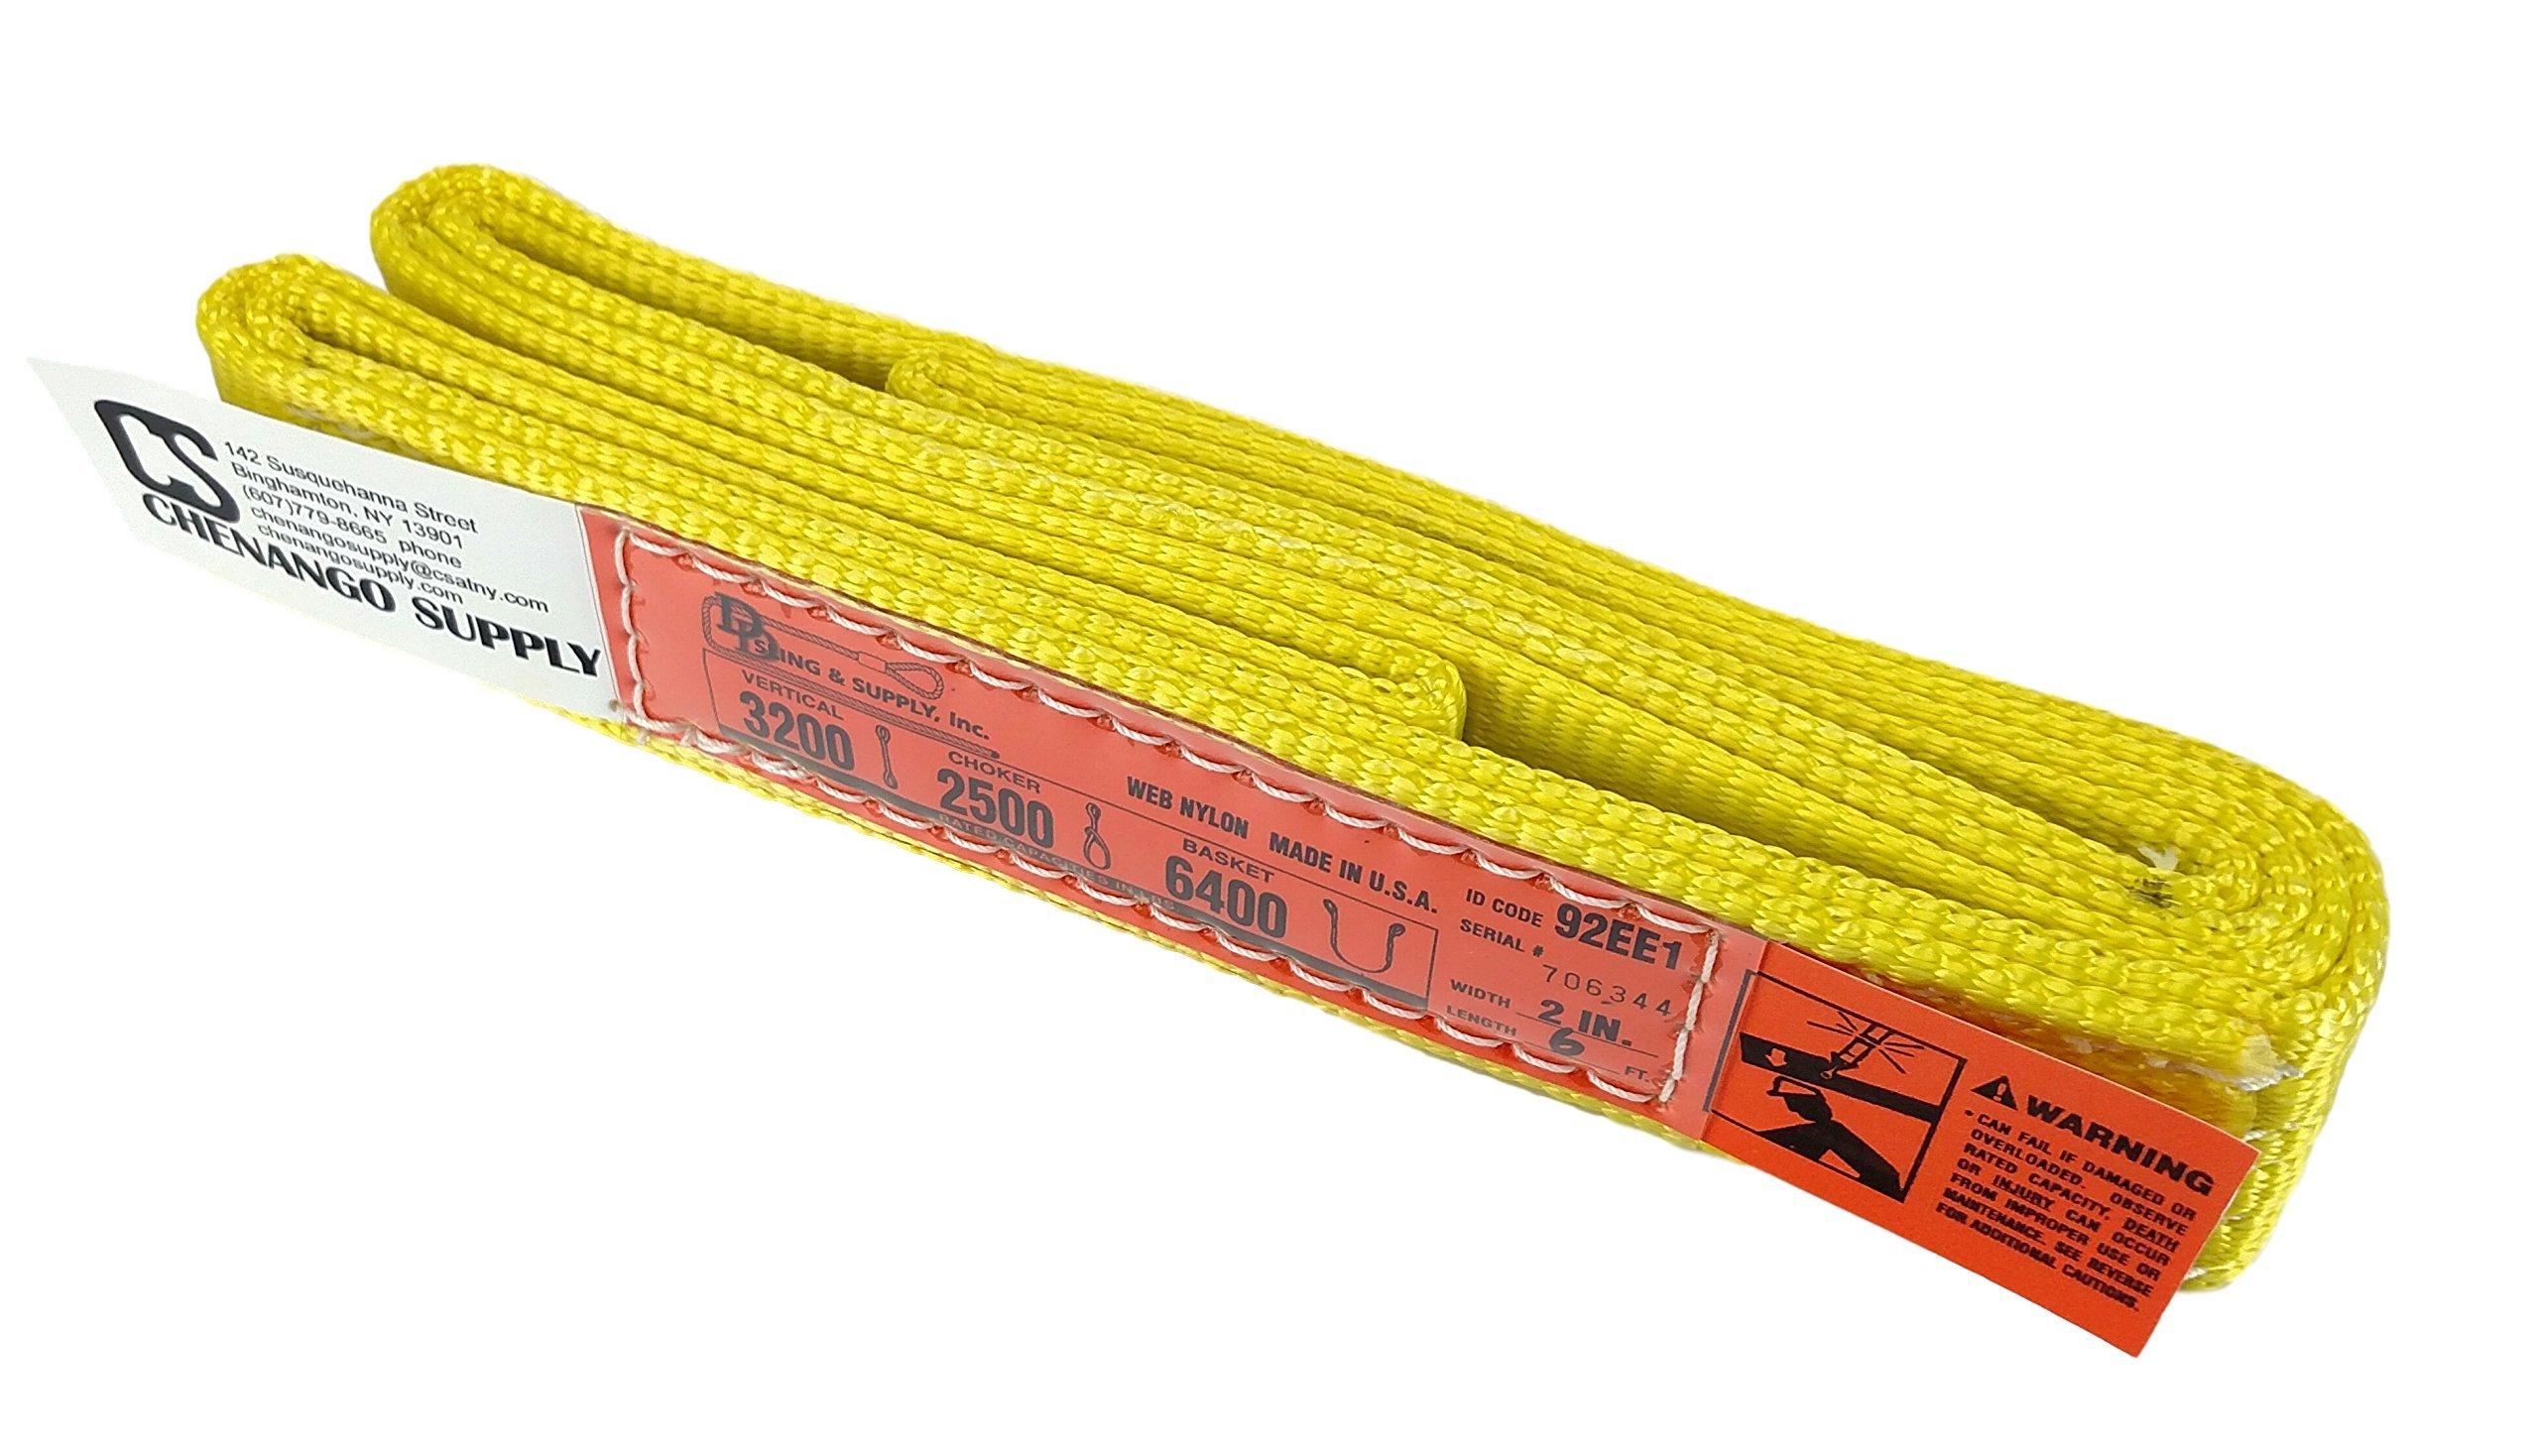 Multi Lengths in Listing! (USA Made), 1-PLY, 2'' Width Nylon Lifting Web Sling. lbs 3,200 Vertical, 2,500 lbs Choker, 6,400 lbs Basket Capacity, Eye & Eye, Heavy Duty (USA 900 webbing) (2''x6') by DD Sling & Supply, Inc.